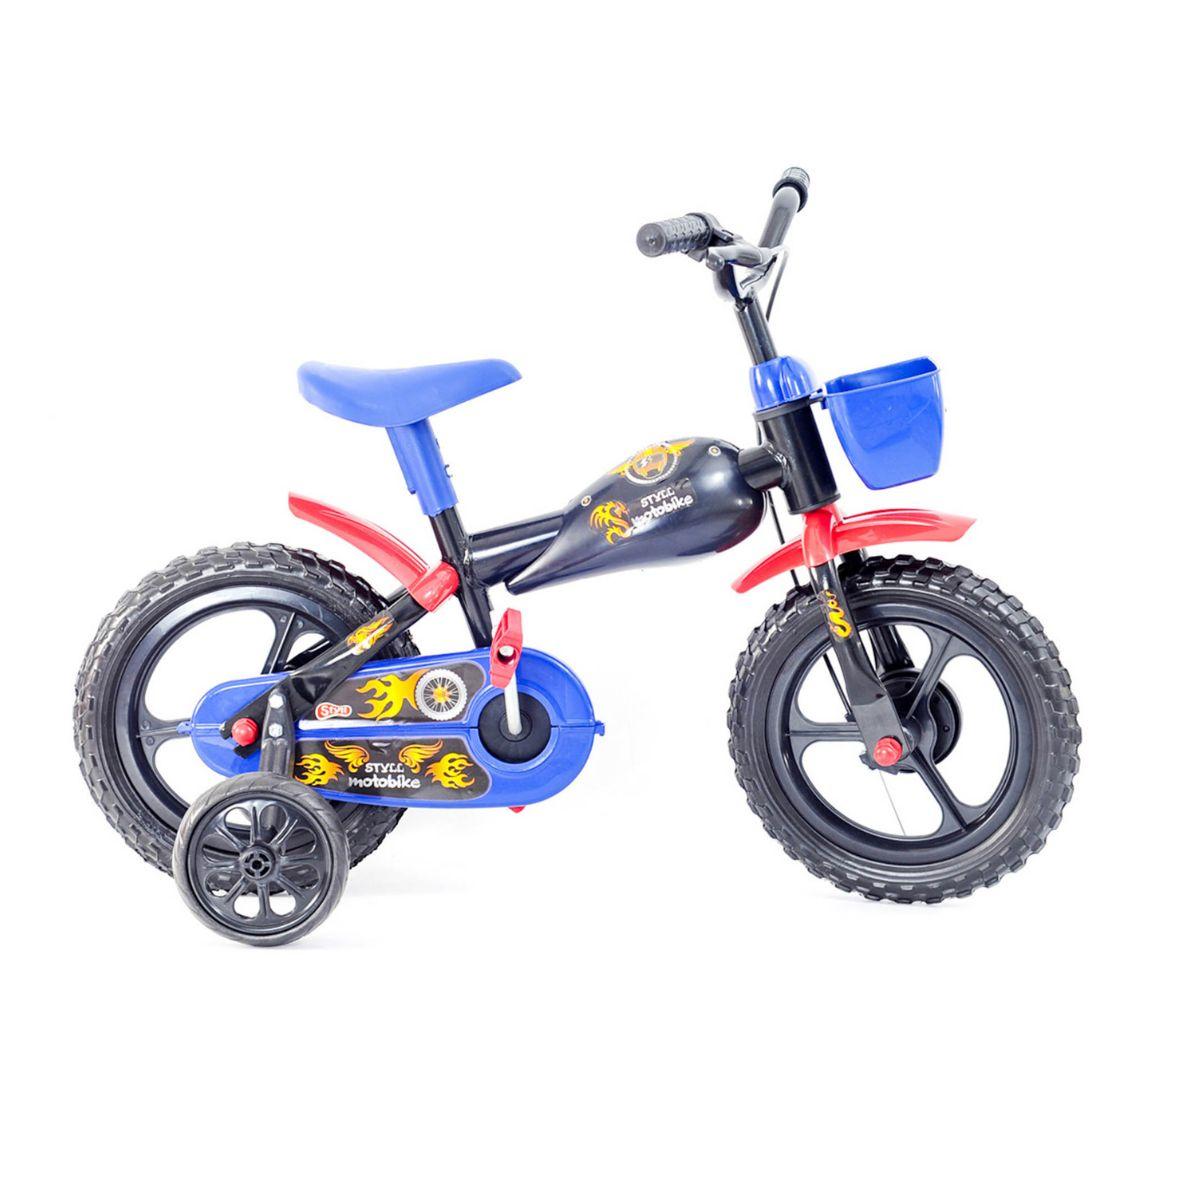 Bicicleta  Infantil Styll Baby Motobike Aro 12 Cor Preto